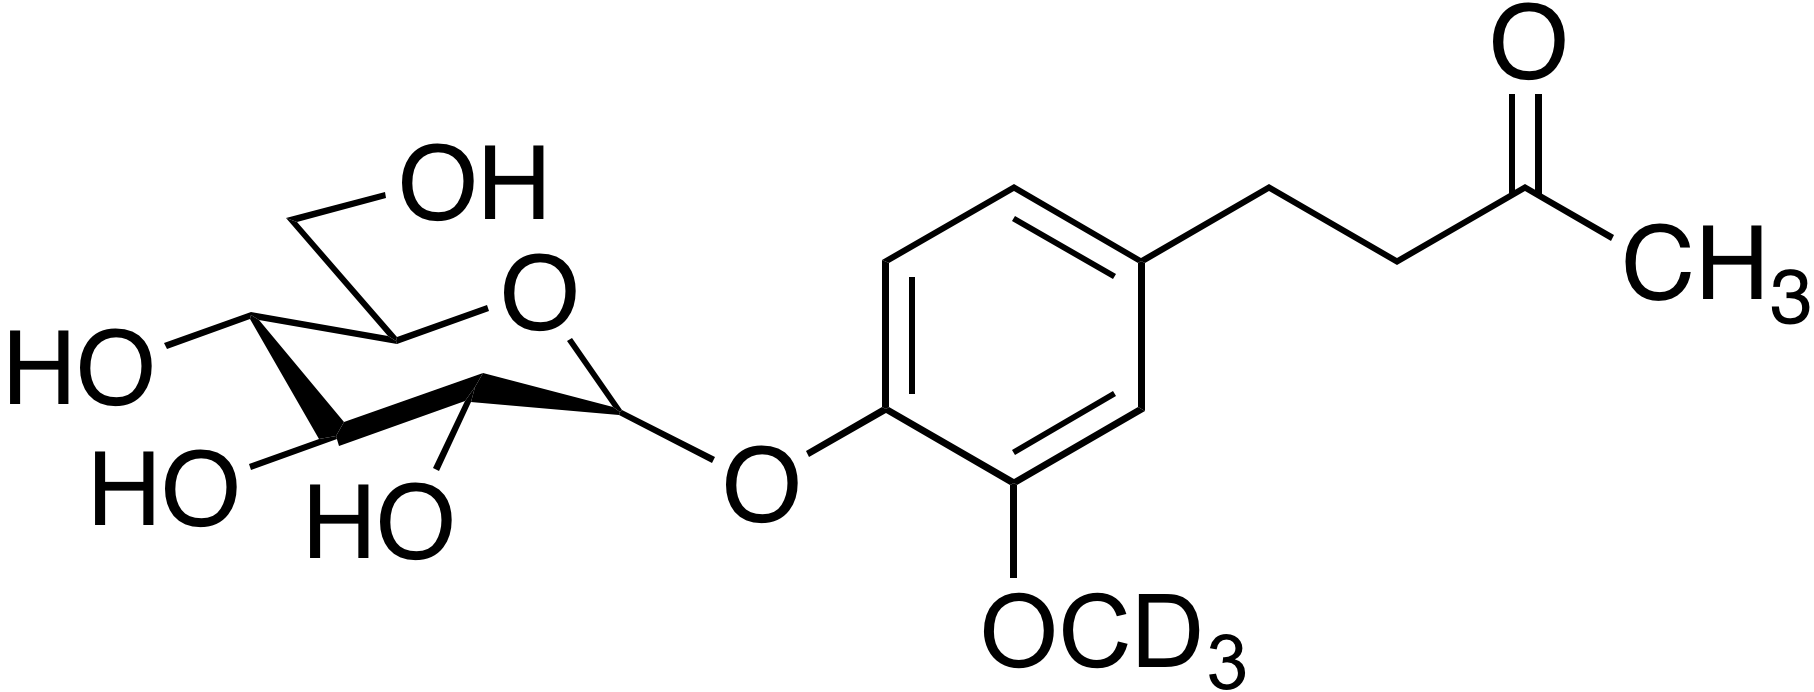 Zingerone-d<sub>3</sub> 4-O-β-D-glucopyranoside